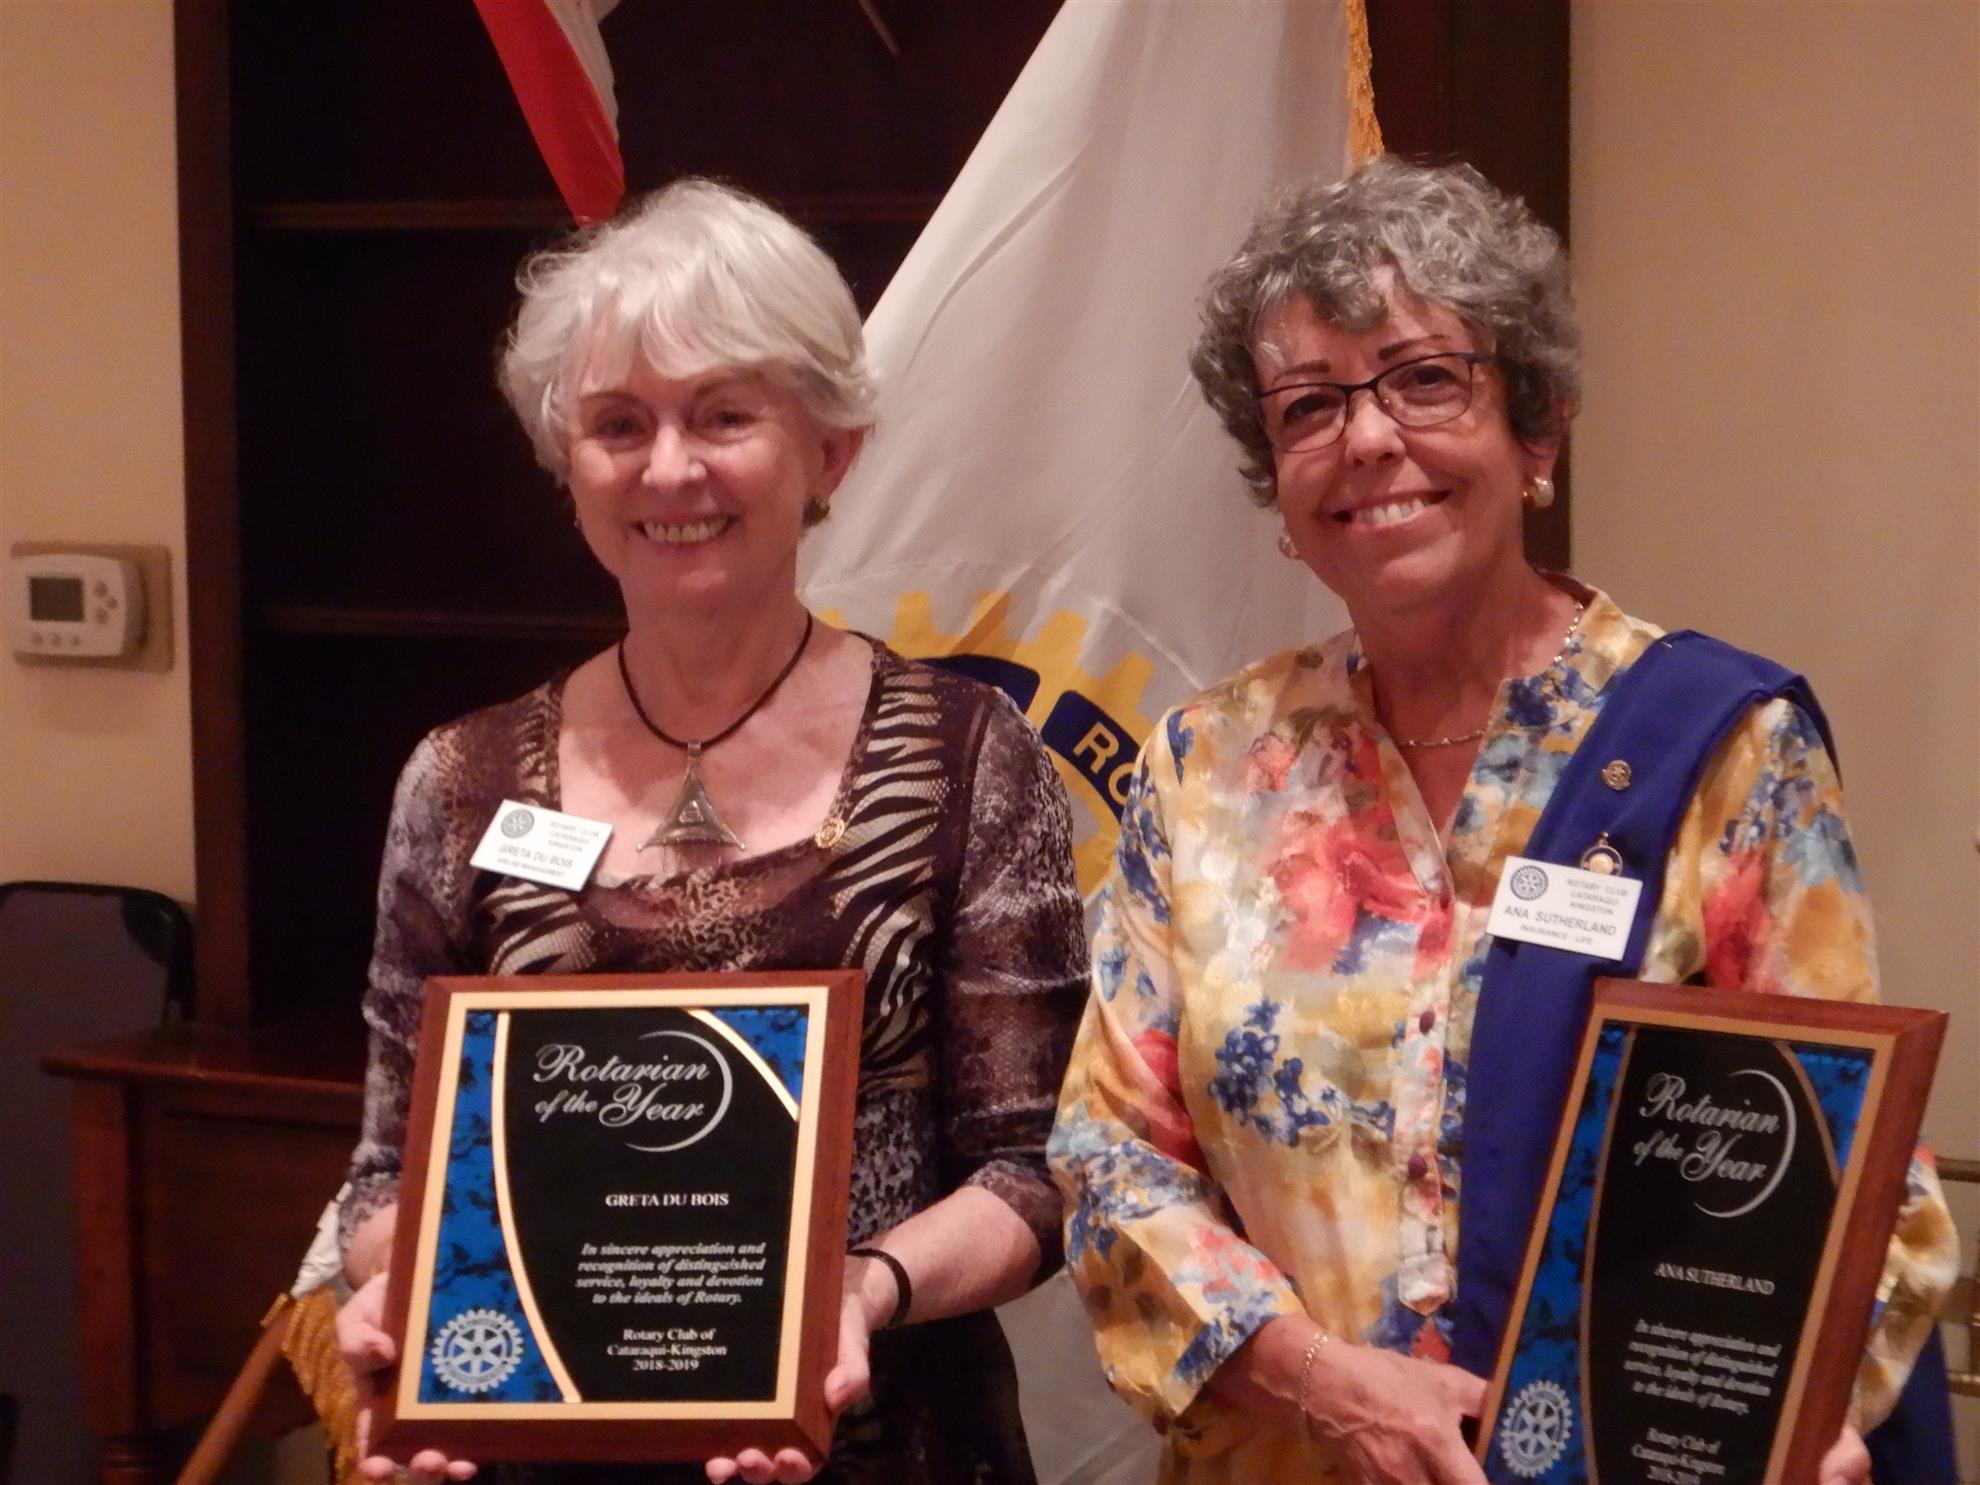 Rotarian of the Year winners Ana and Greta